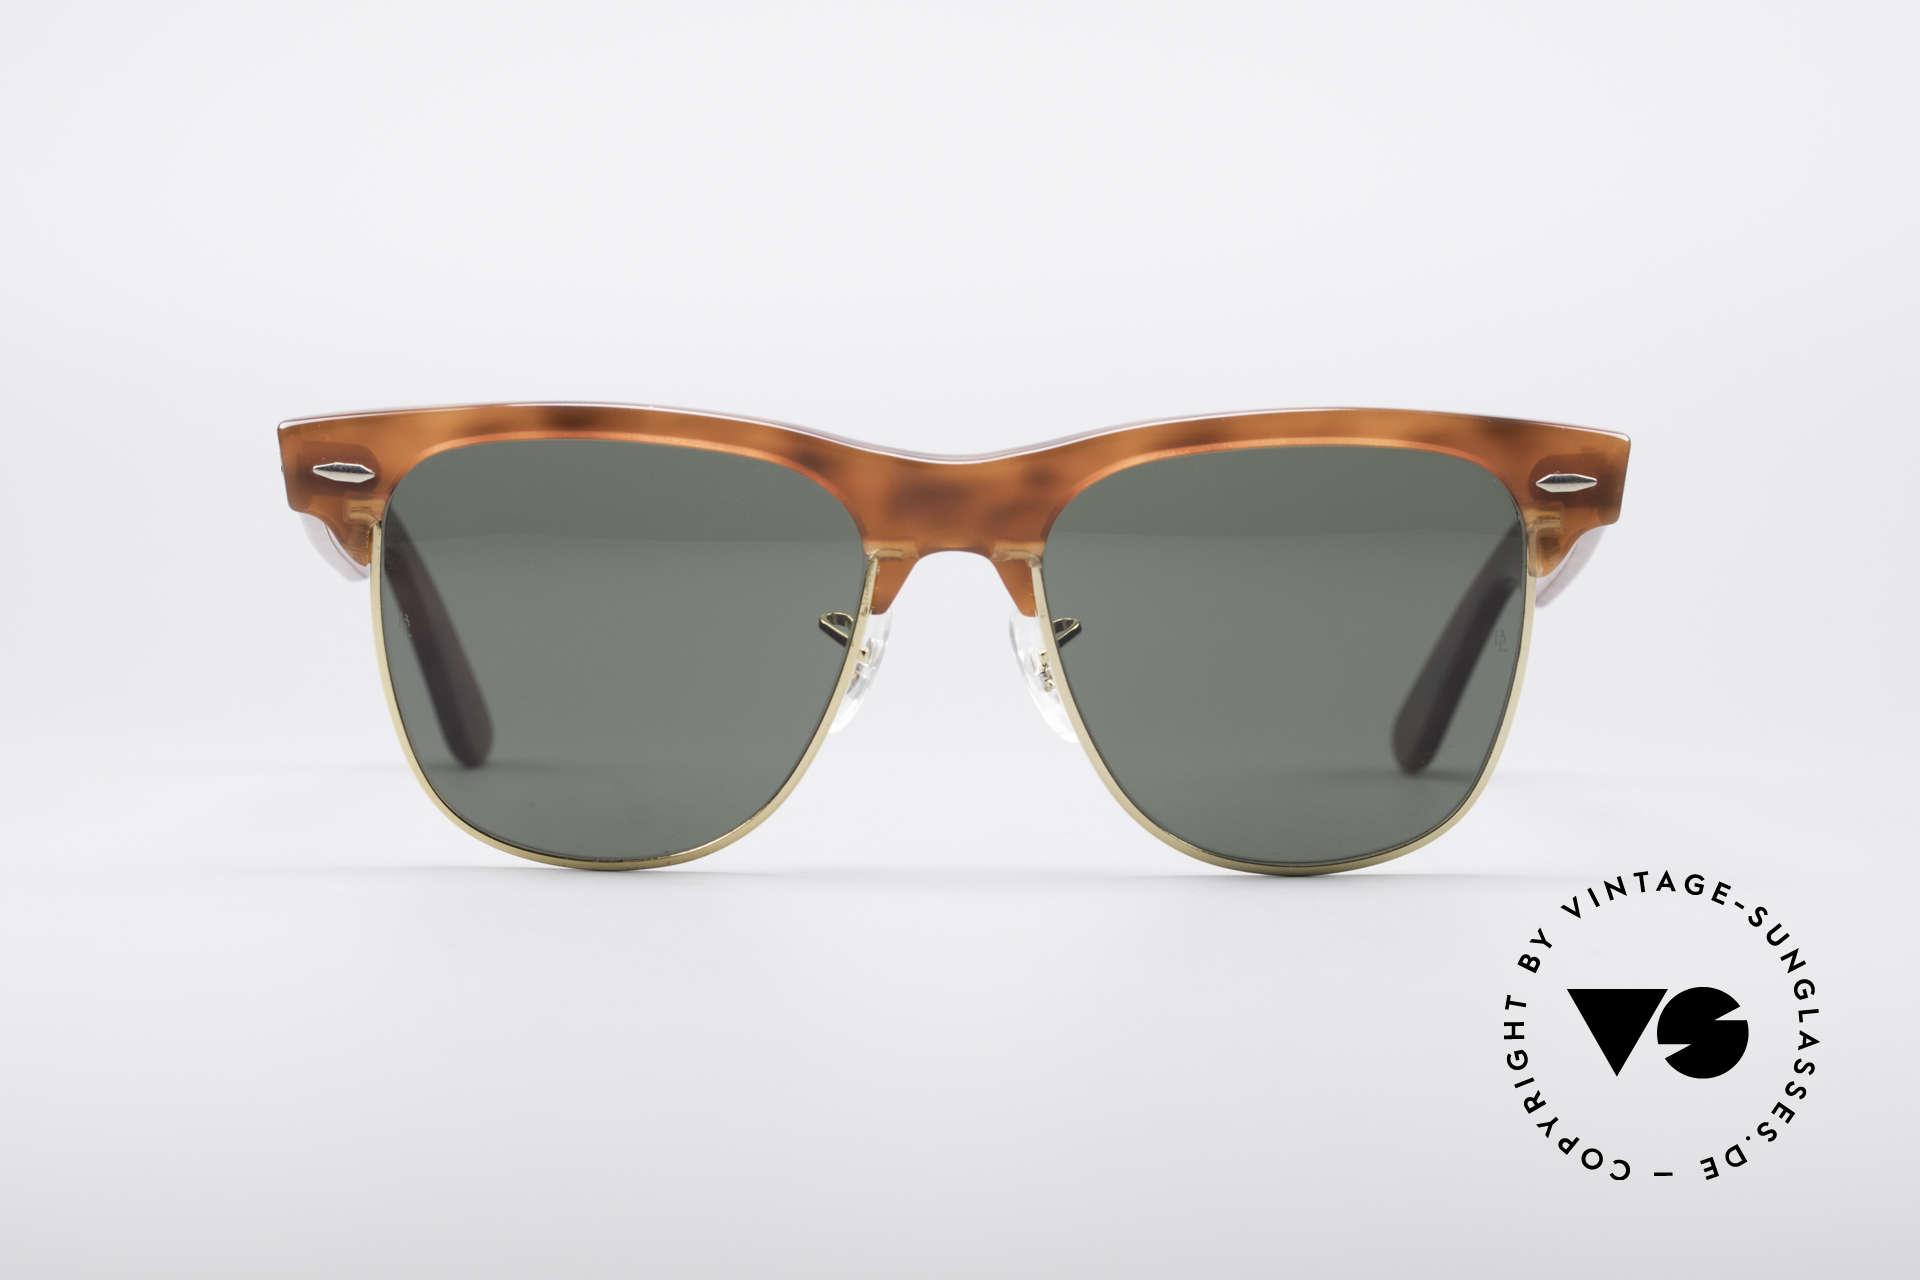 Sunglasses Ray Ban Wayfarer Max Ii B Amp L Usa Sunglasses